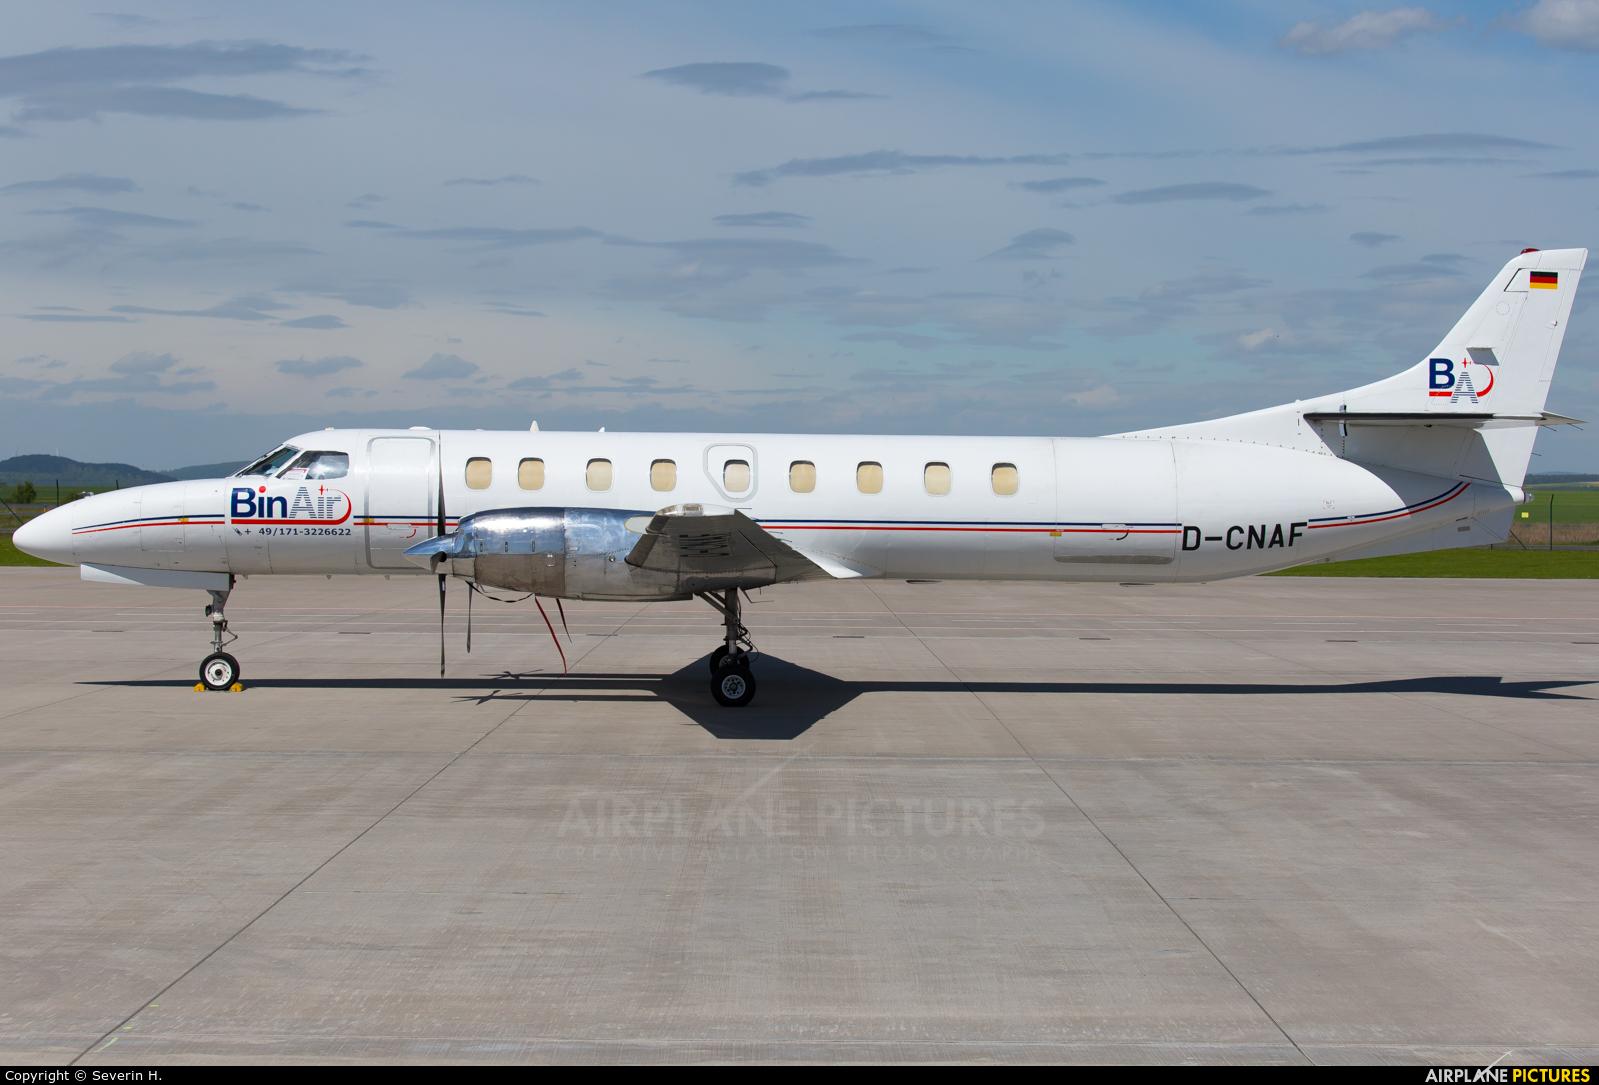 Bin Air D-CNAF aircraft at Kassel-Calden